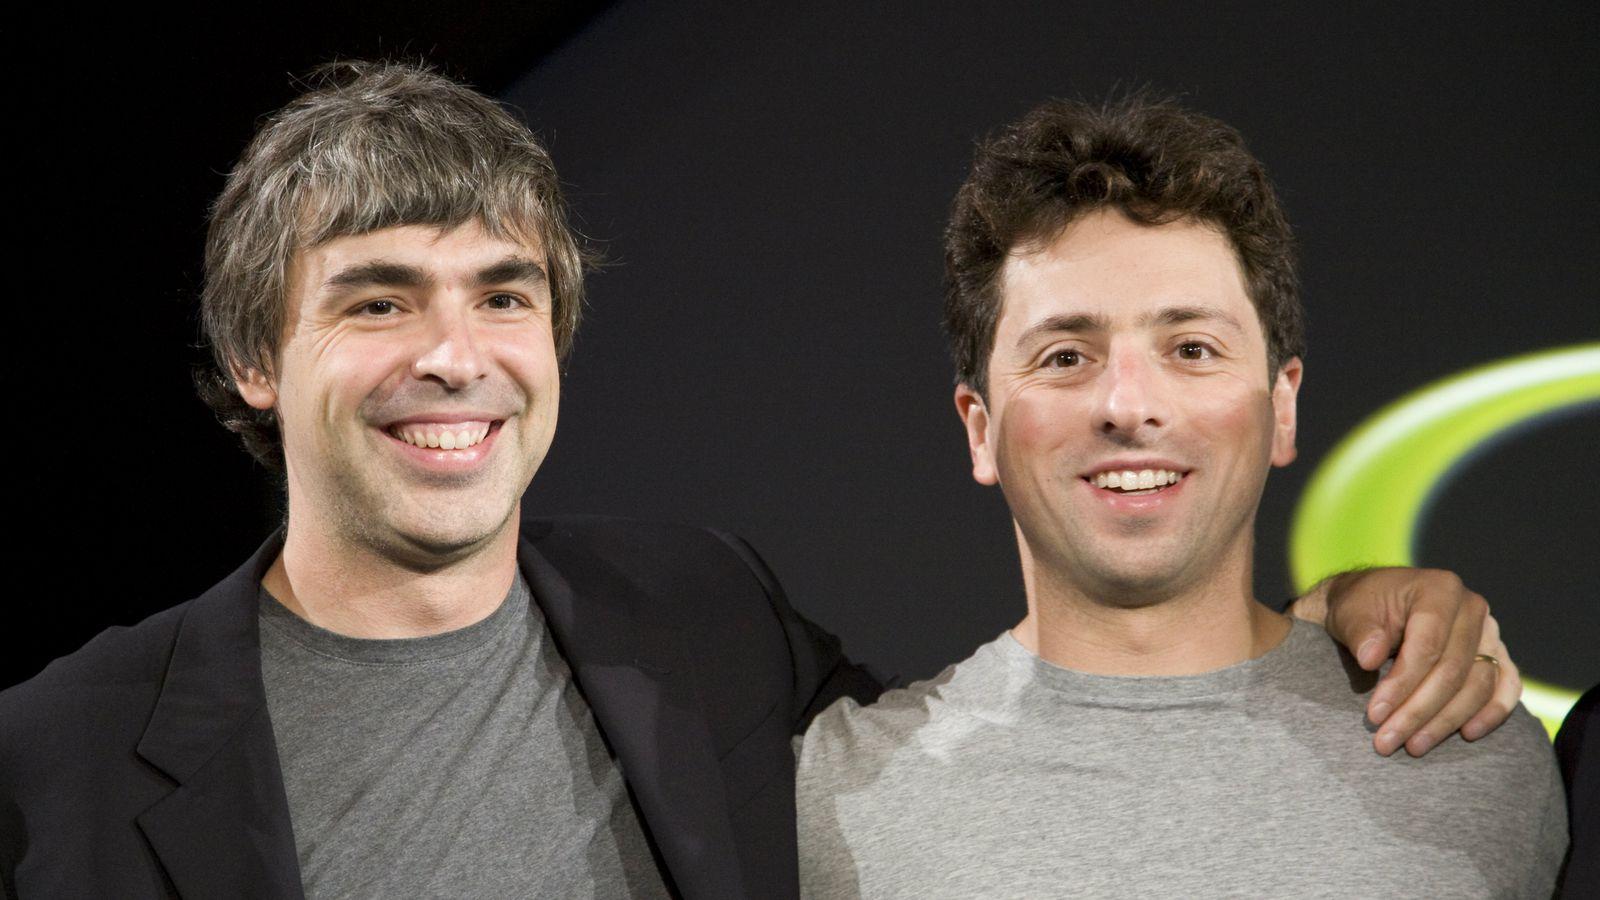 Entrepreneuriat - Larry Page et Sergey Brin